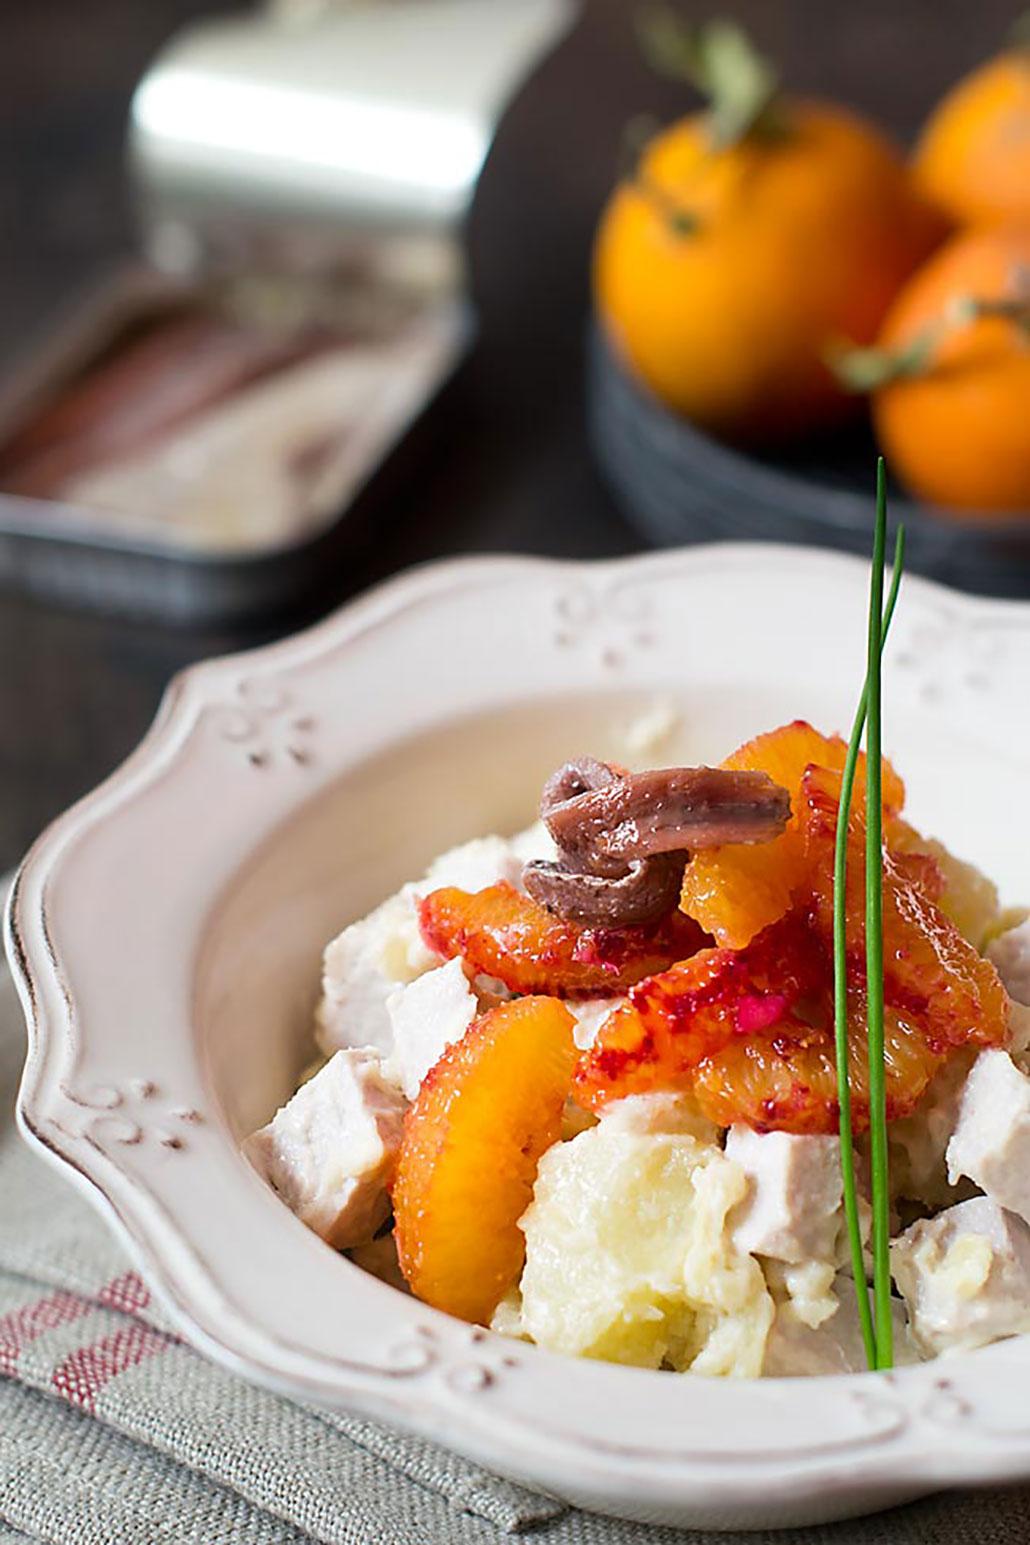 Ensalada anchoas, naranja y lomo